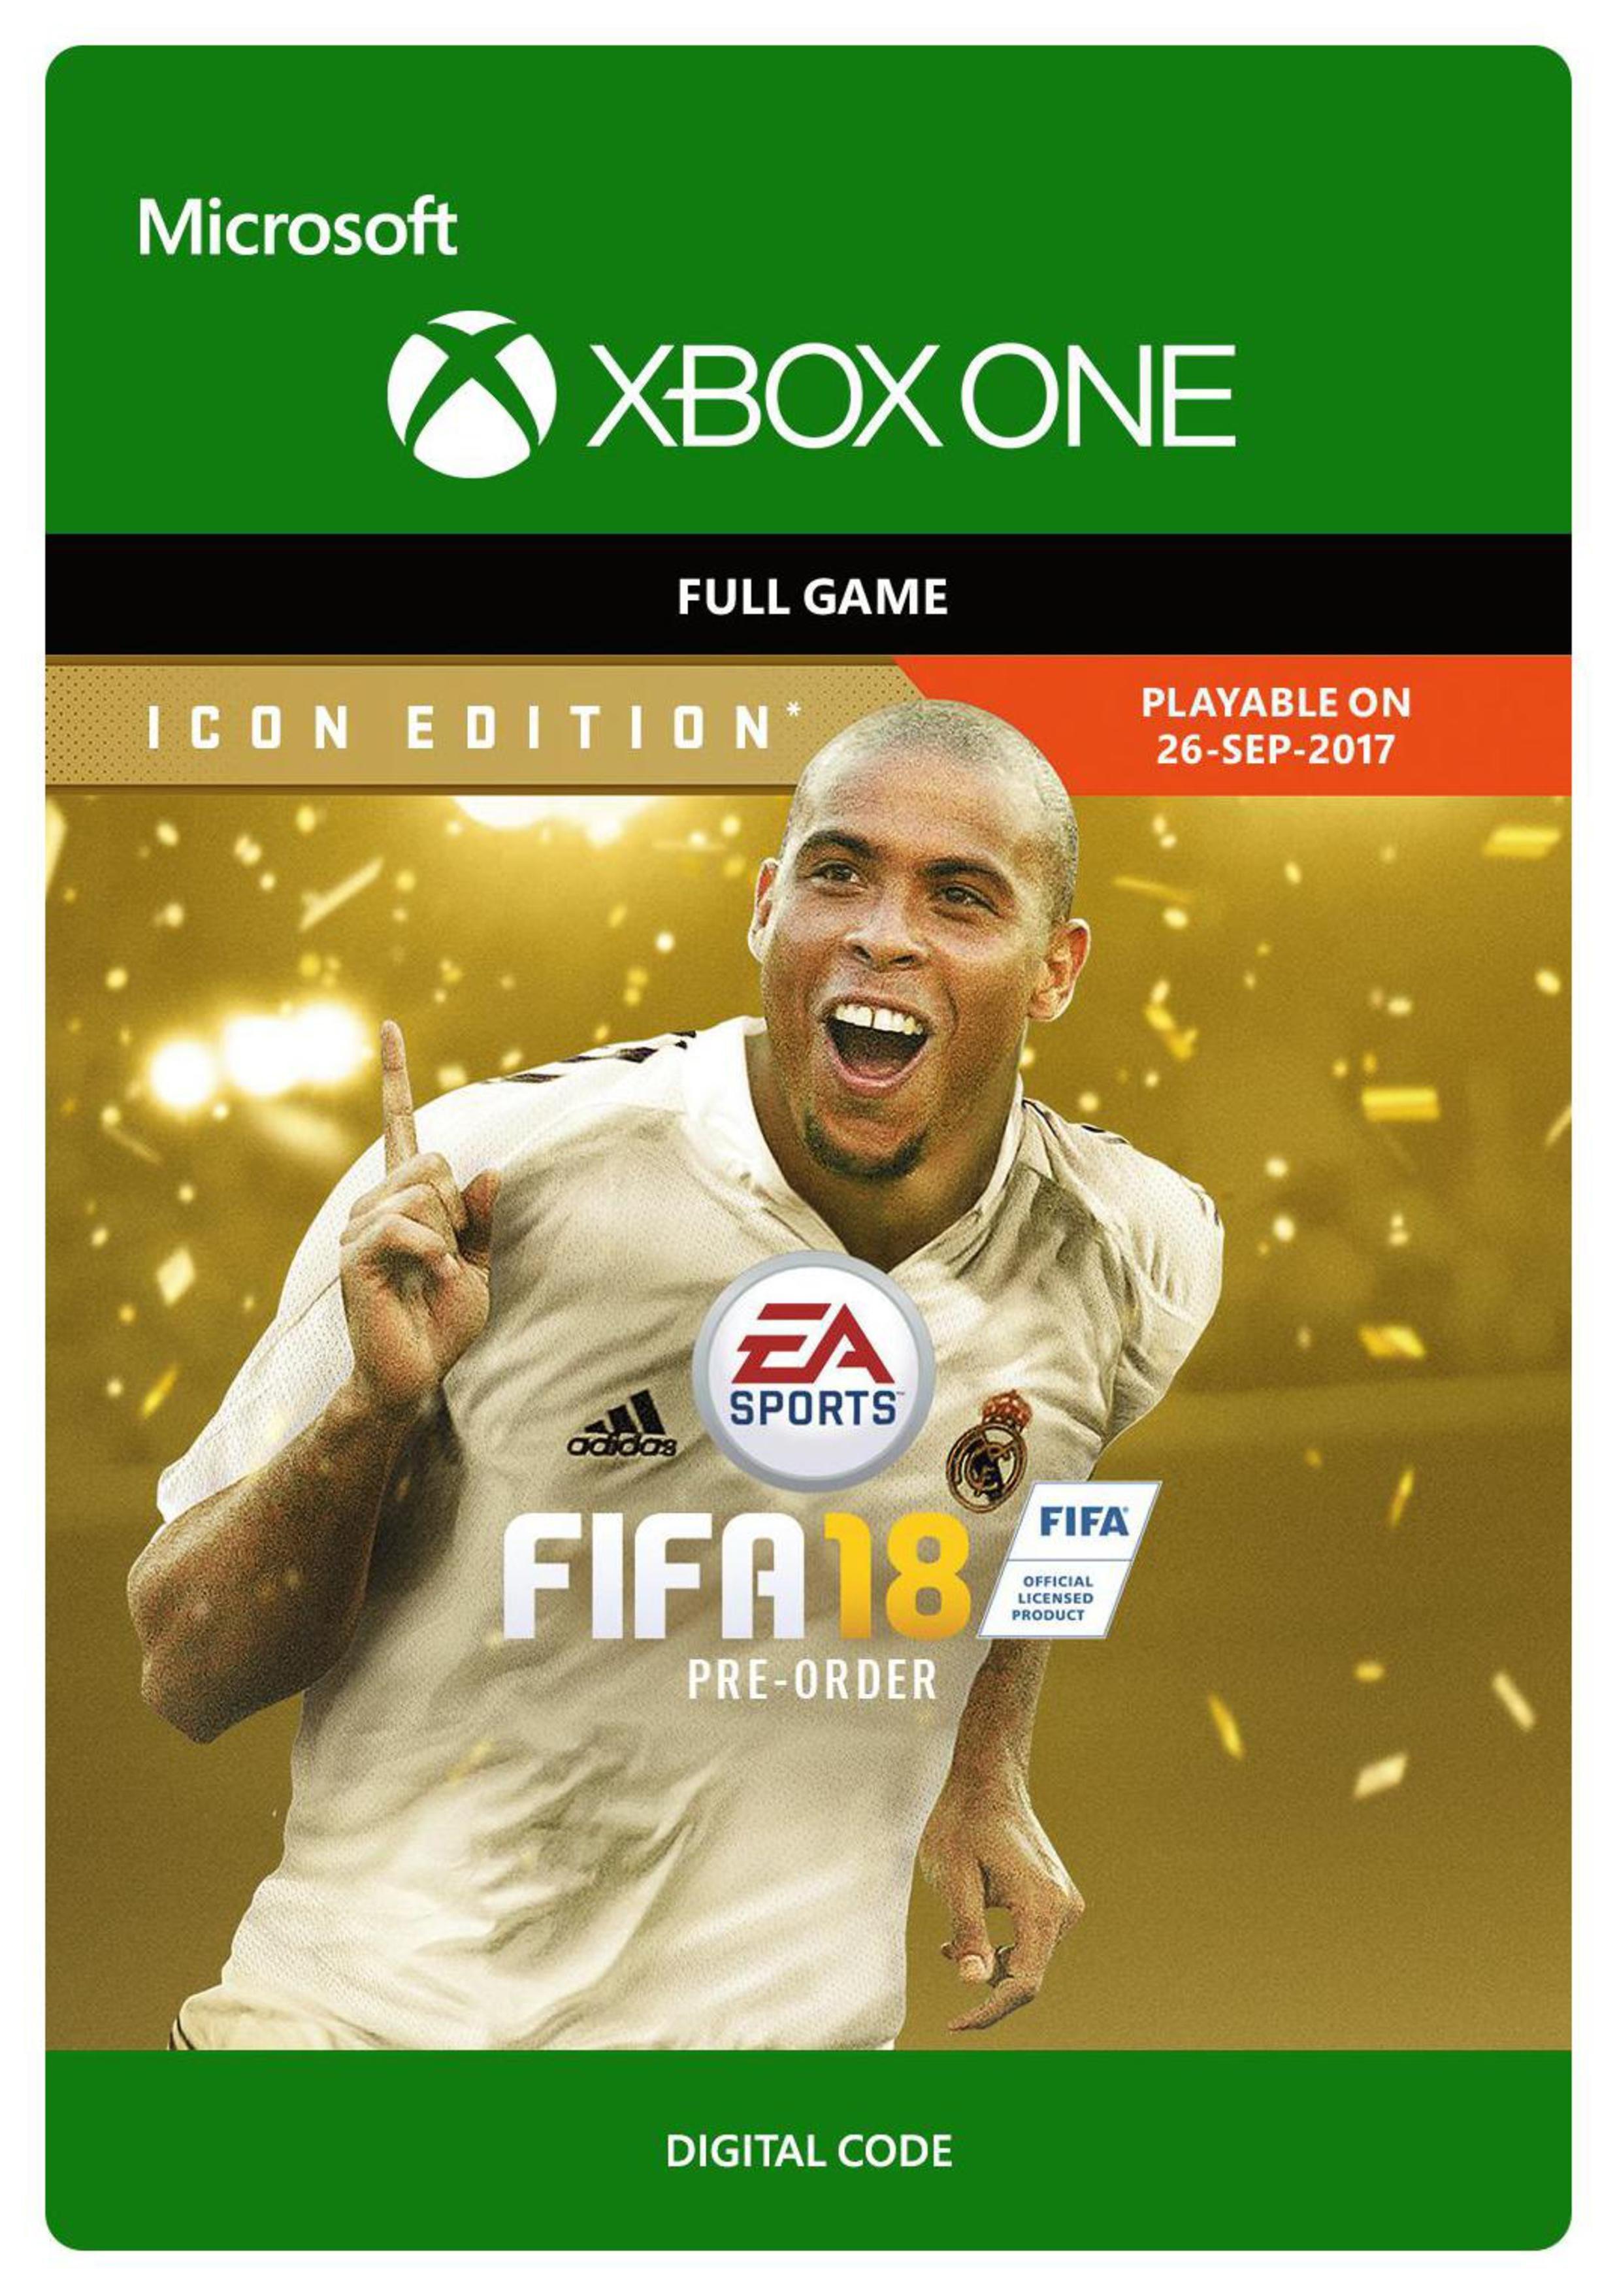 fifa-18-xbox-one-icon-edition-code-on-receipt